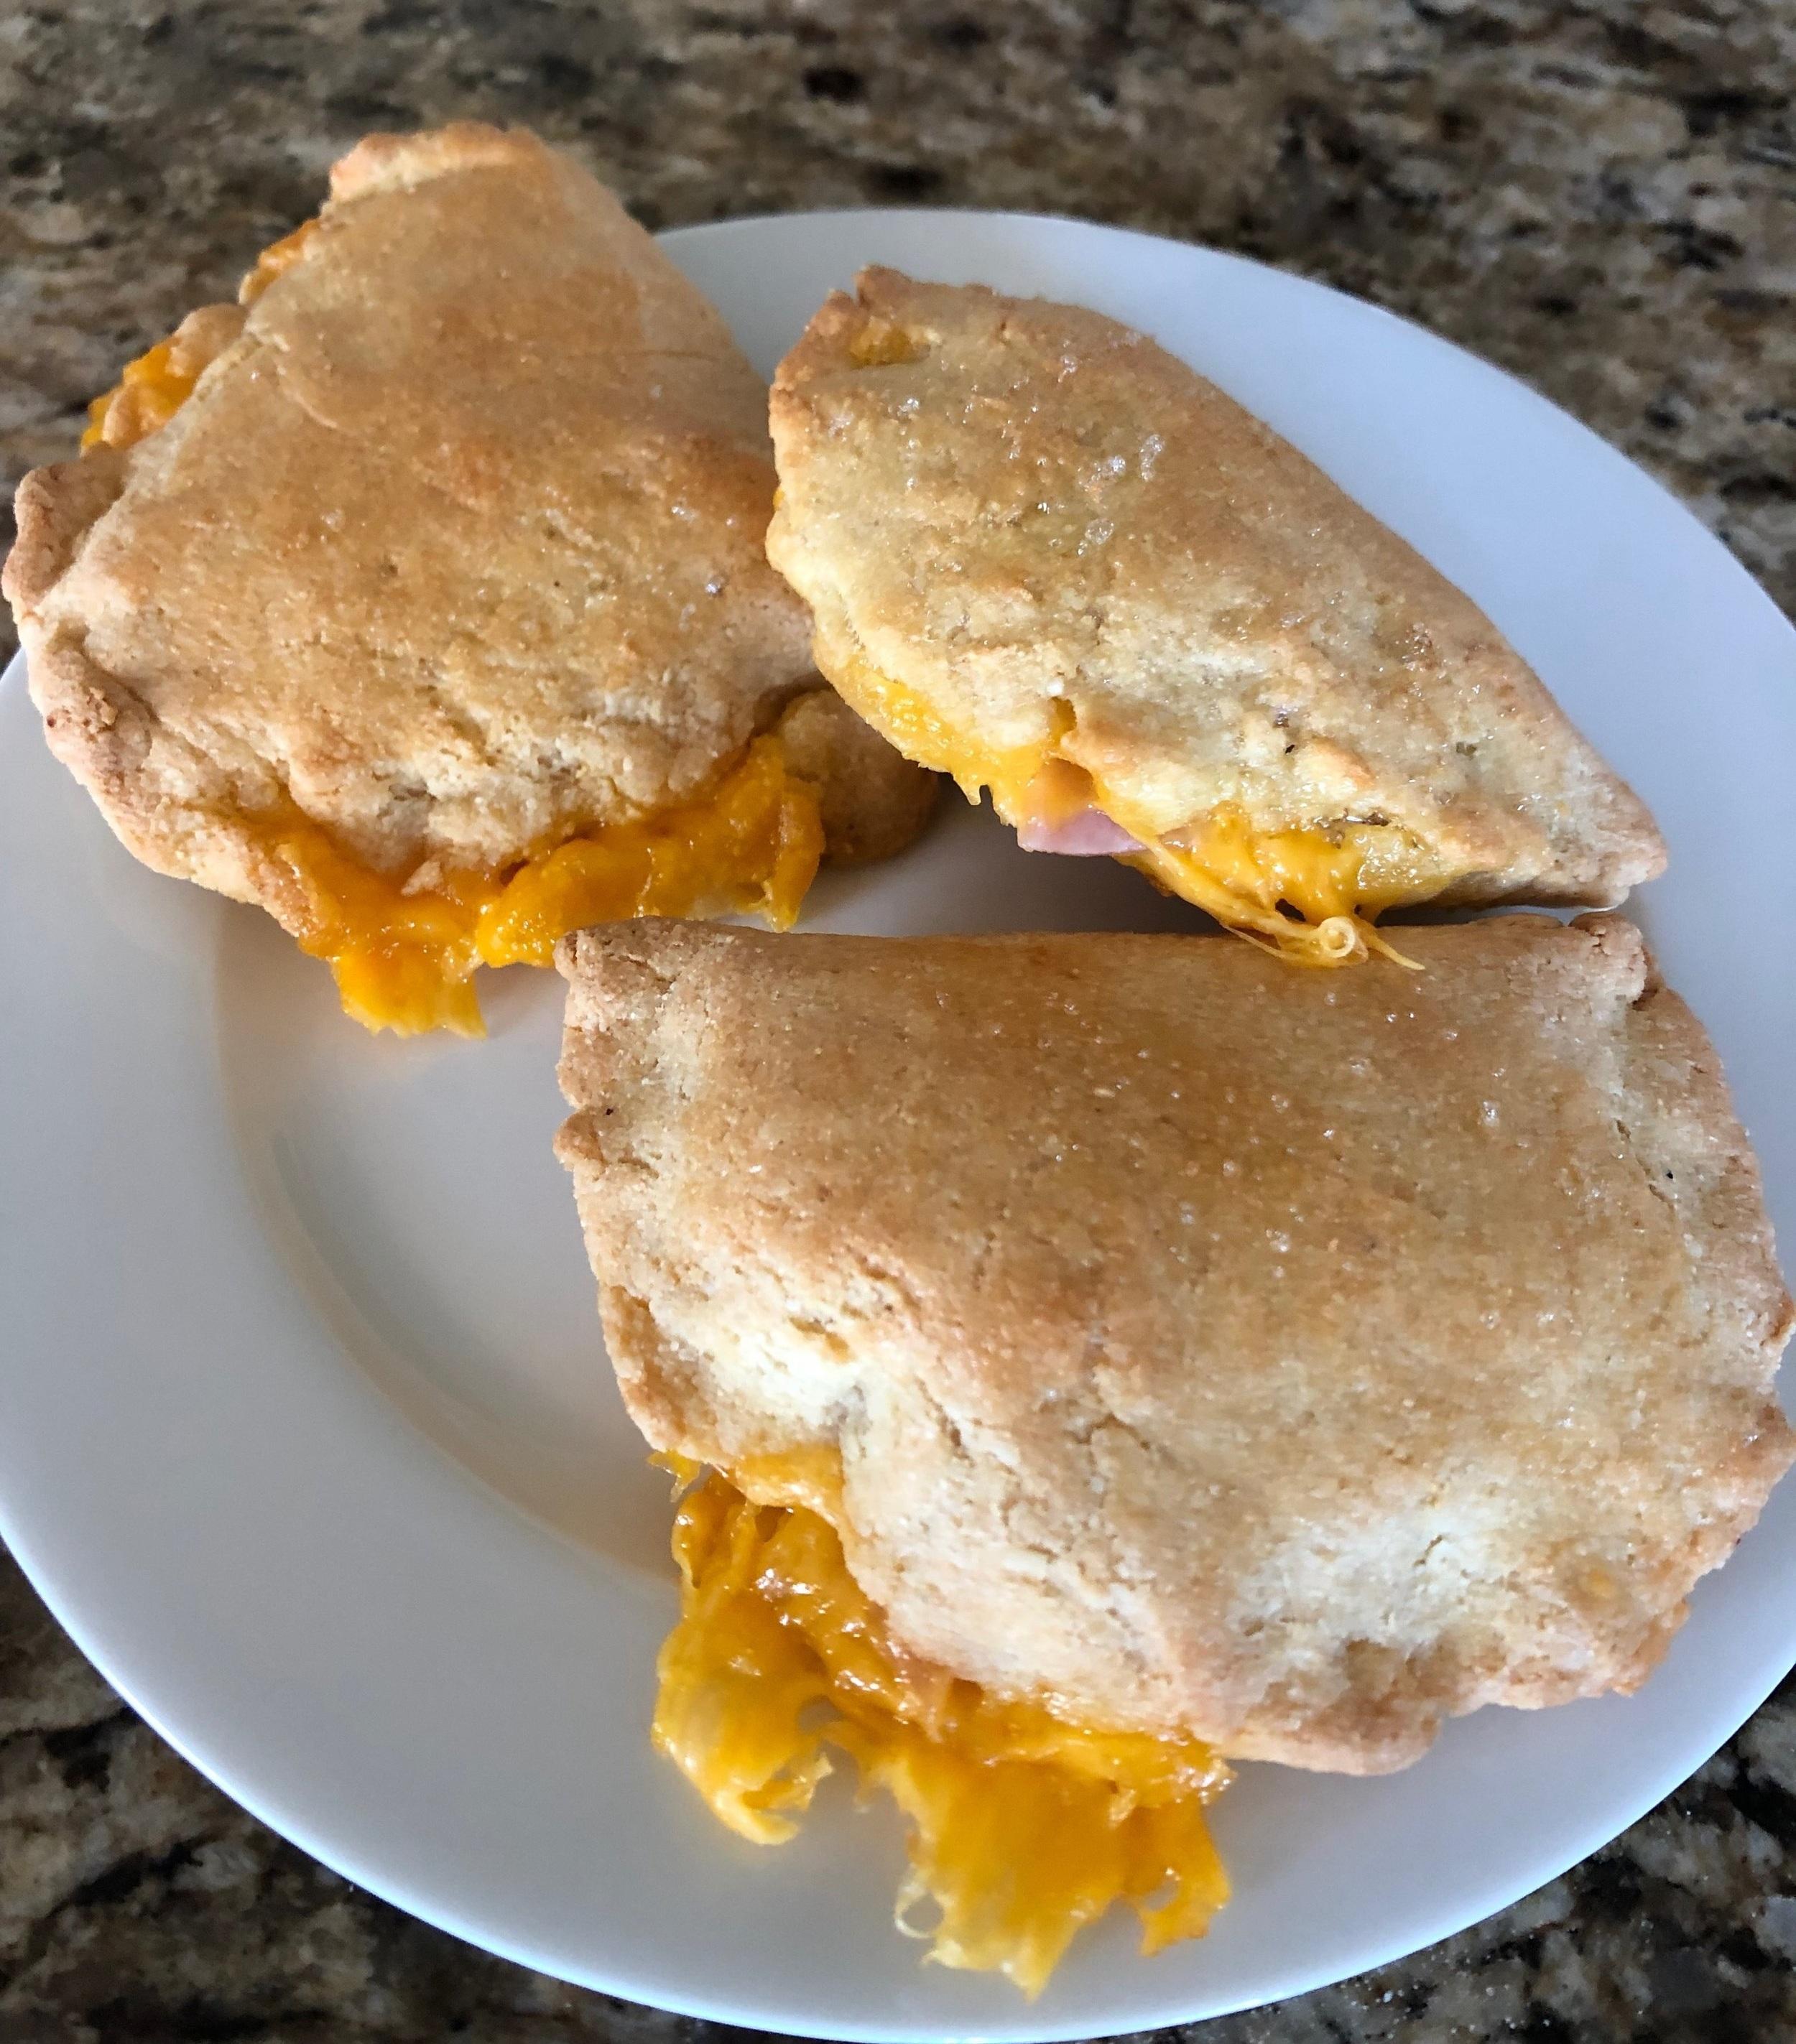 Keto Empanada hot pocket recipe